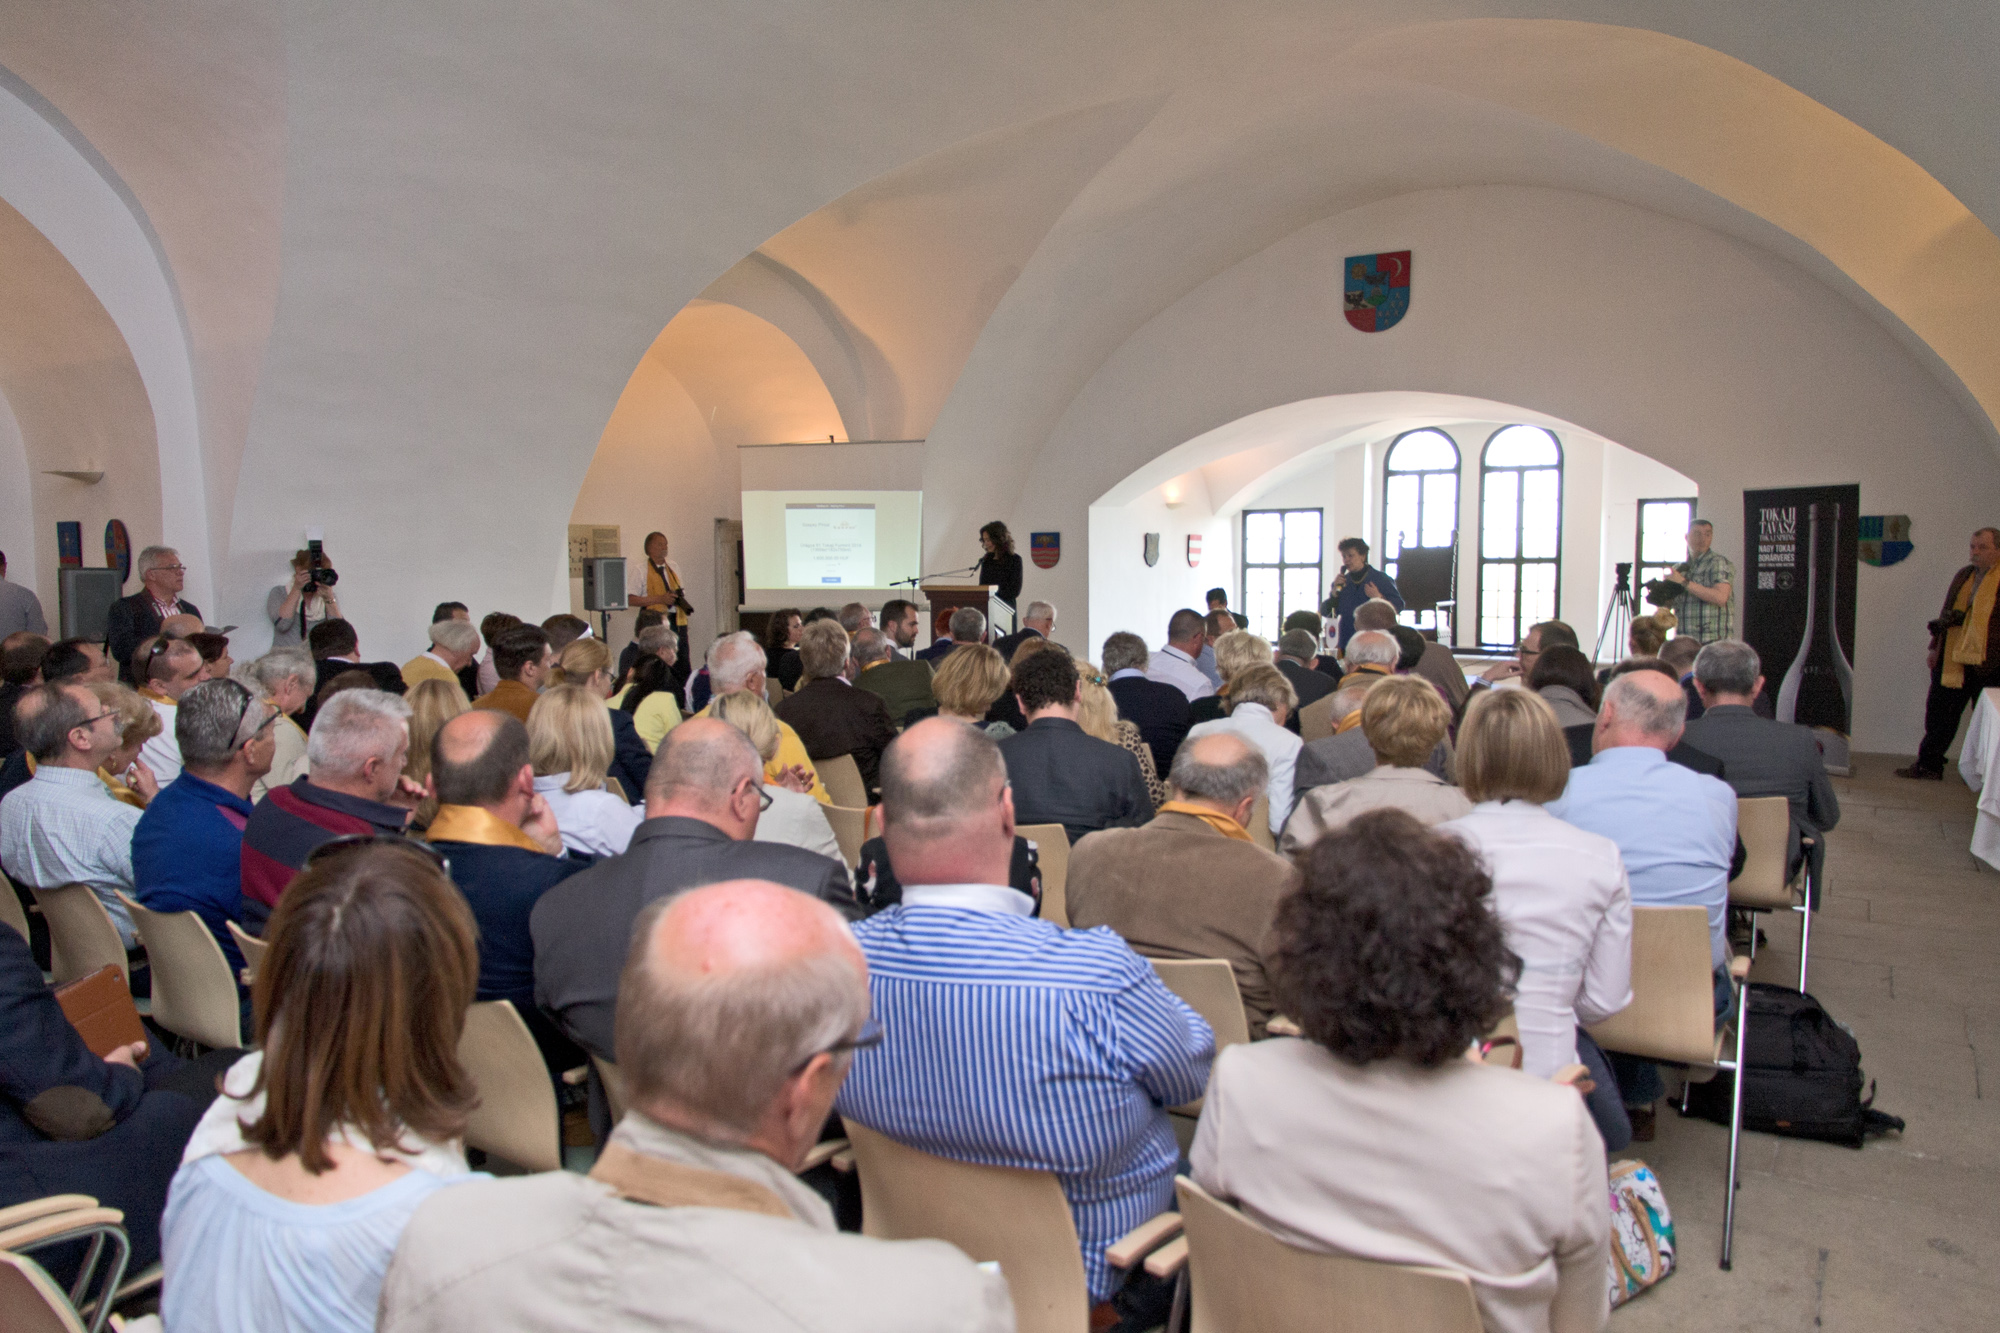 Nagy-Tokaji-Borarveres-2015-terem-Tokaji-borlovagrend-Szentirmai-Zsolt